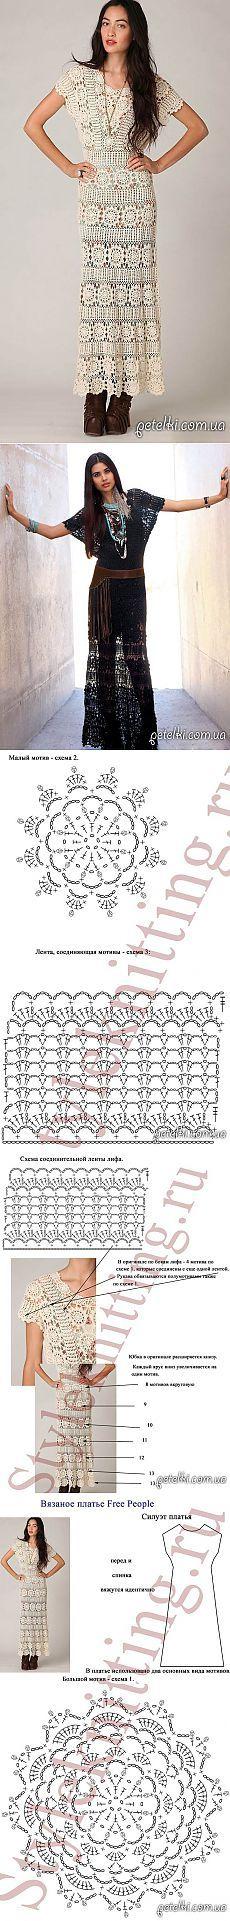 Elegant cârlig rochie lunga.  Descriere și scheme ale tricotat